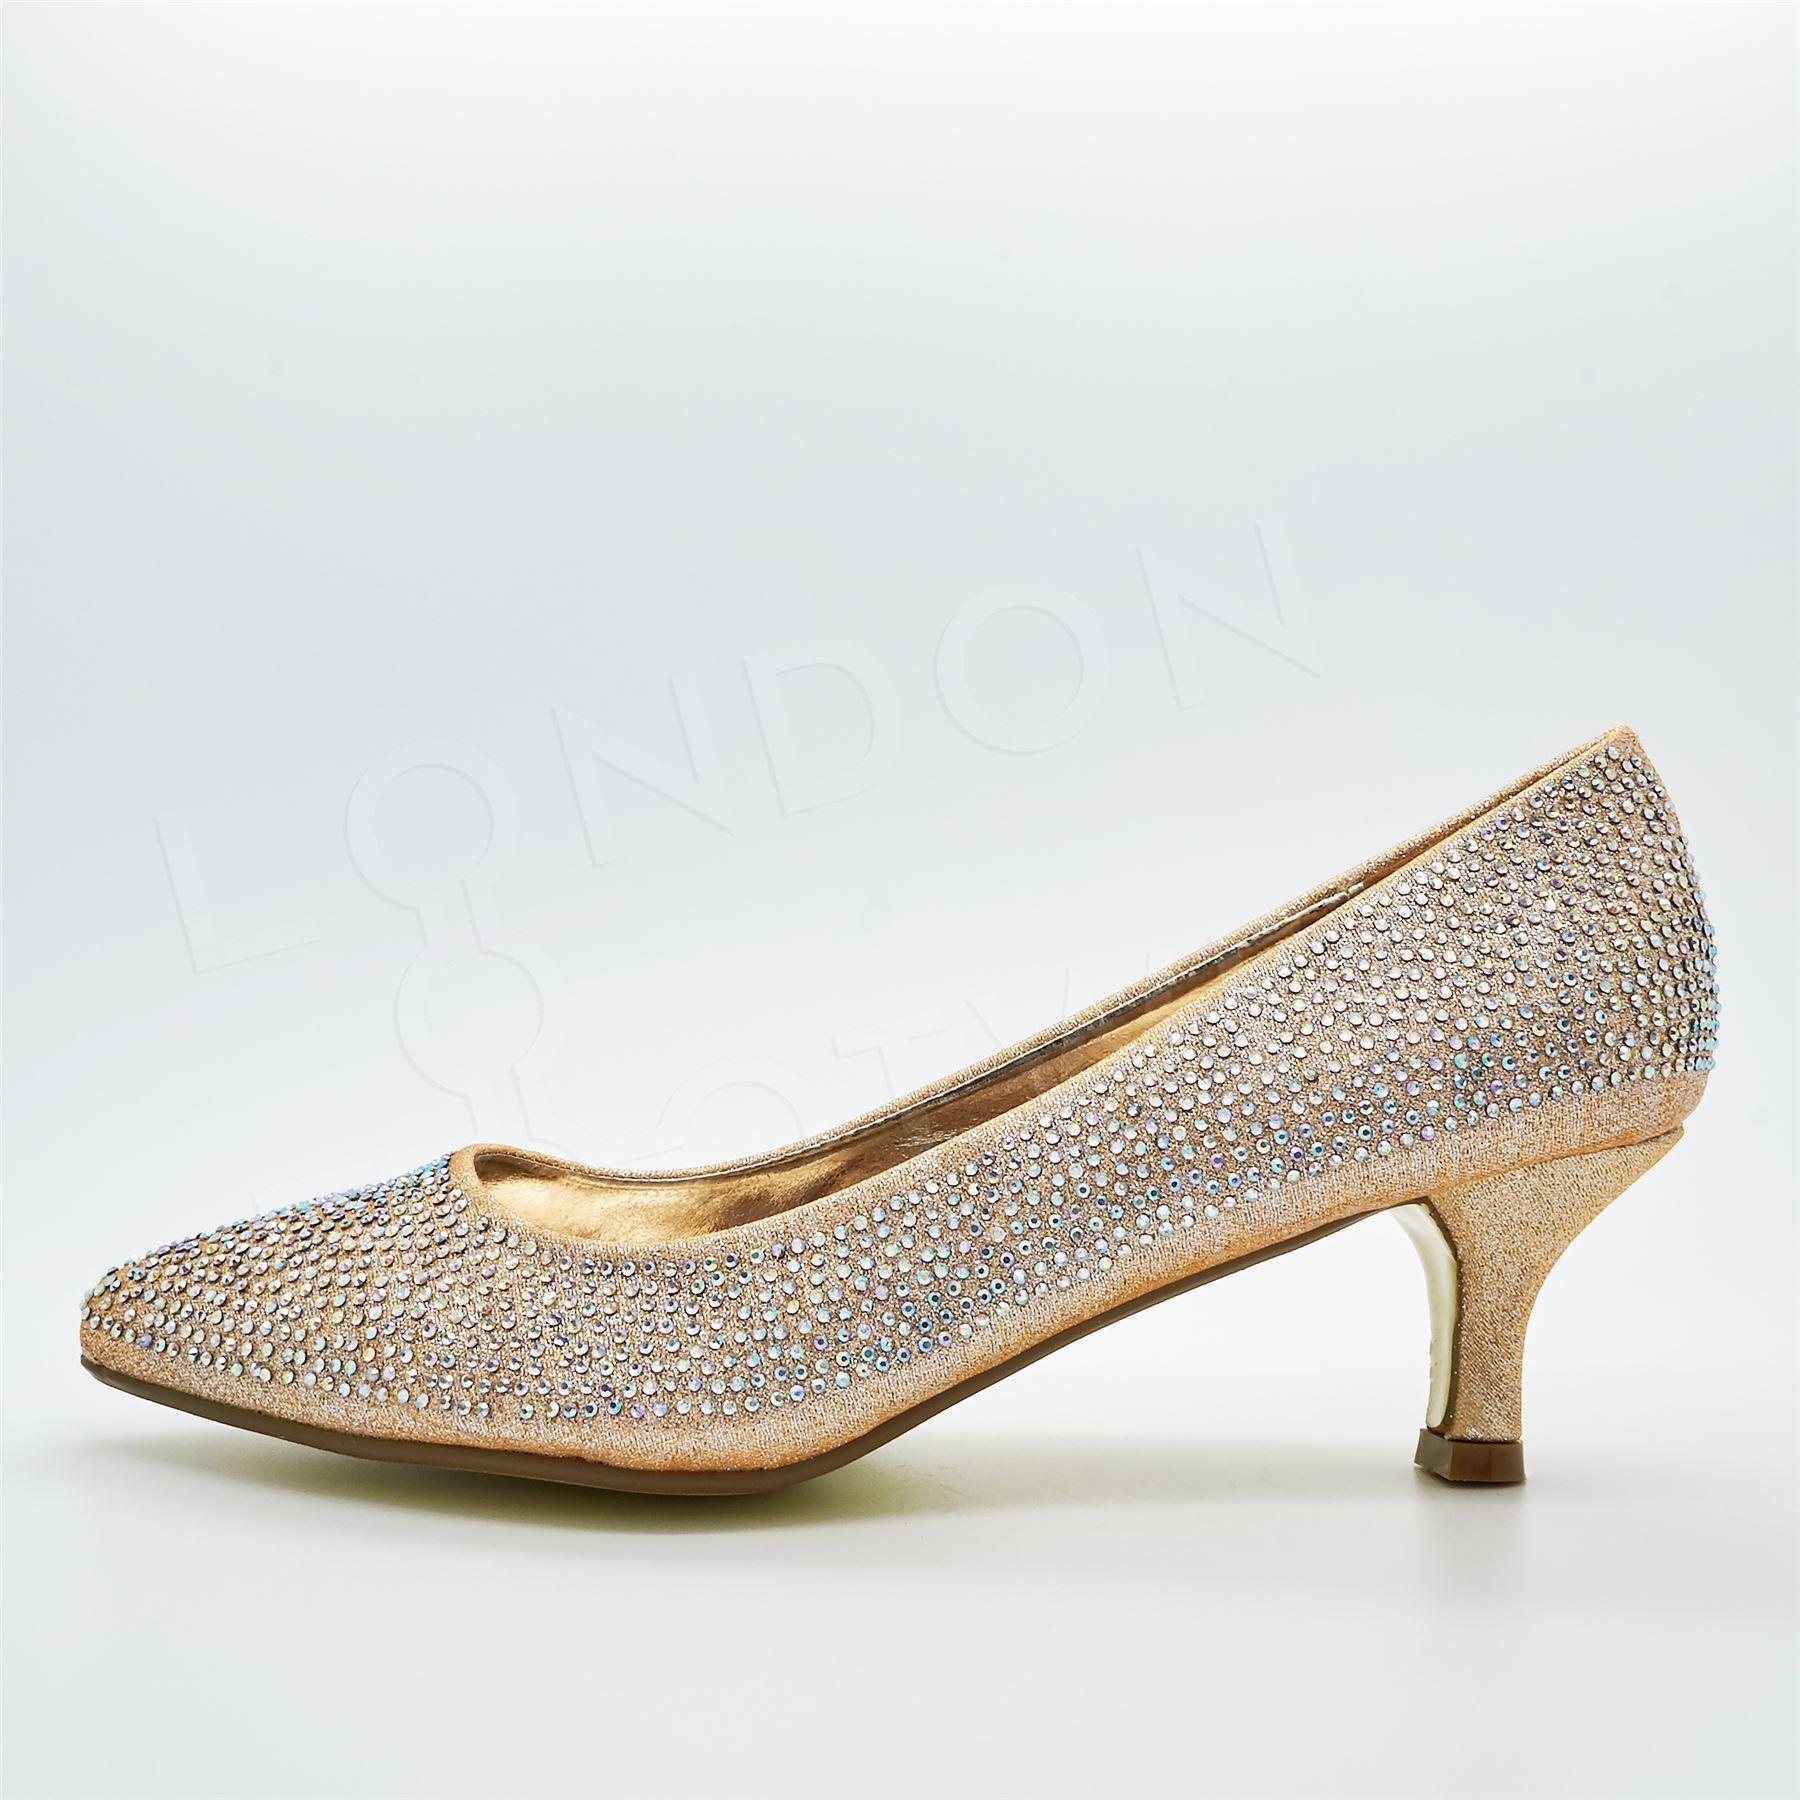 new womens low kitten heel court shoes diamante